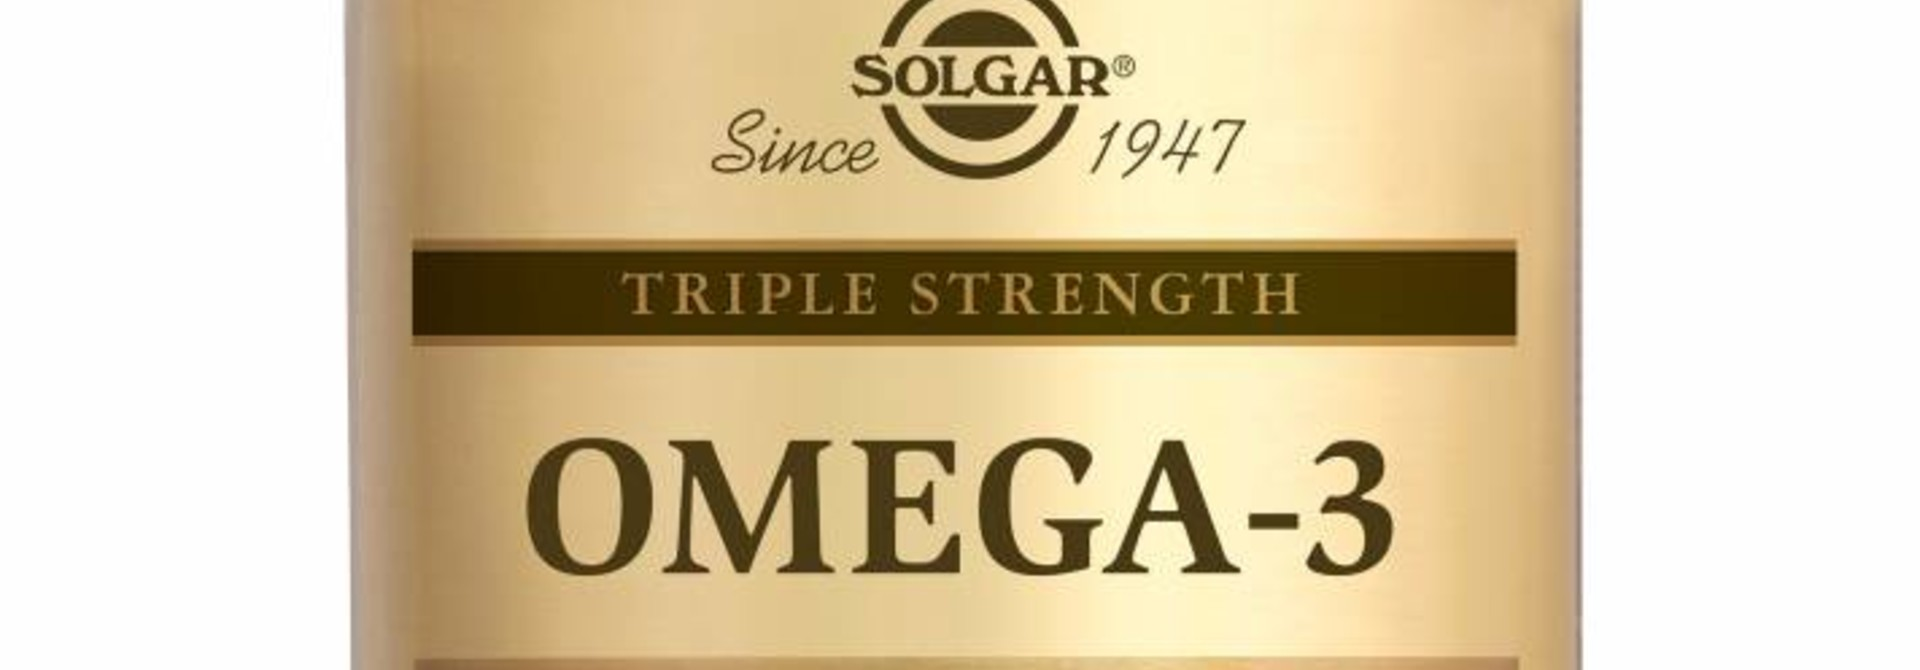 Omega-3 Triple Strength 50 softgels